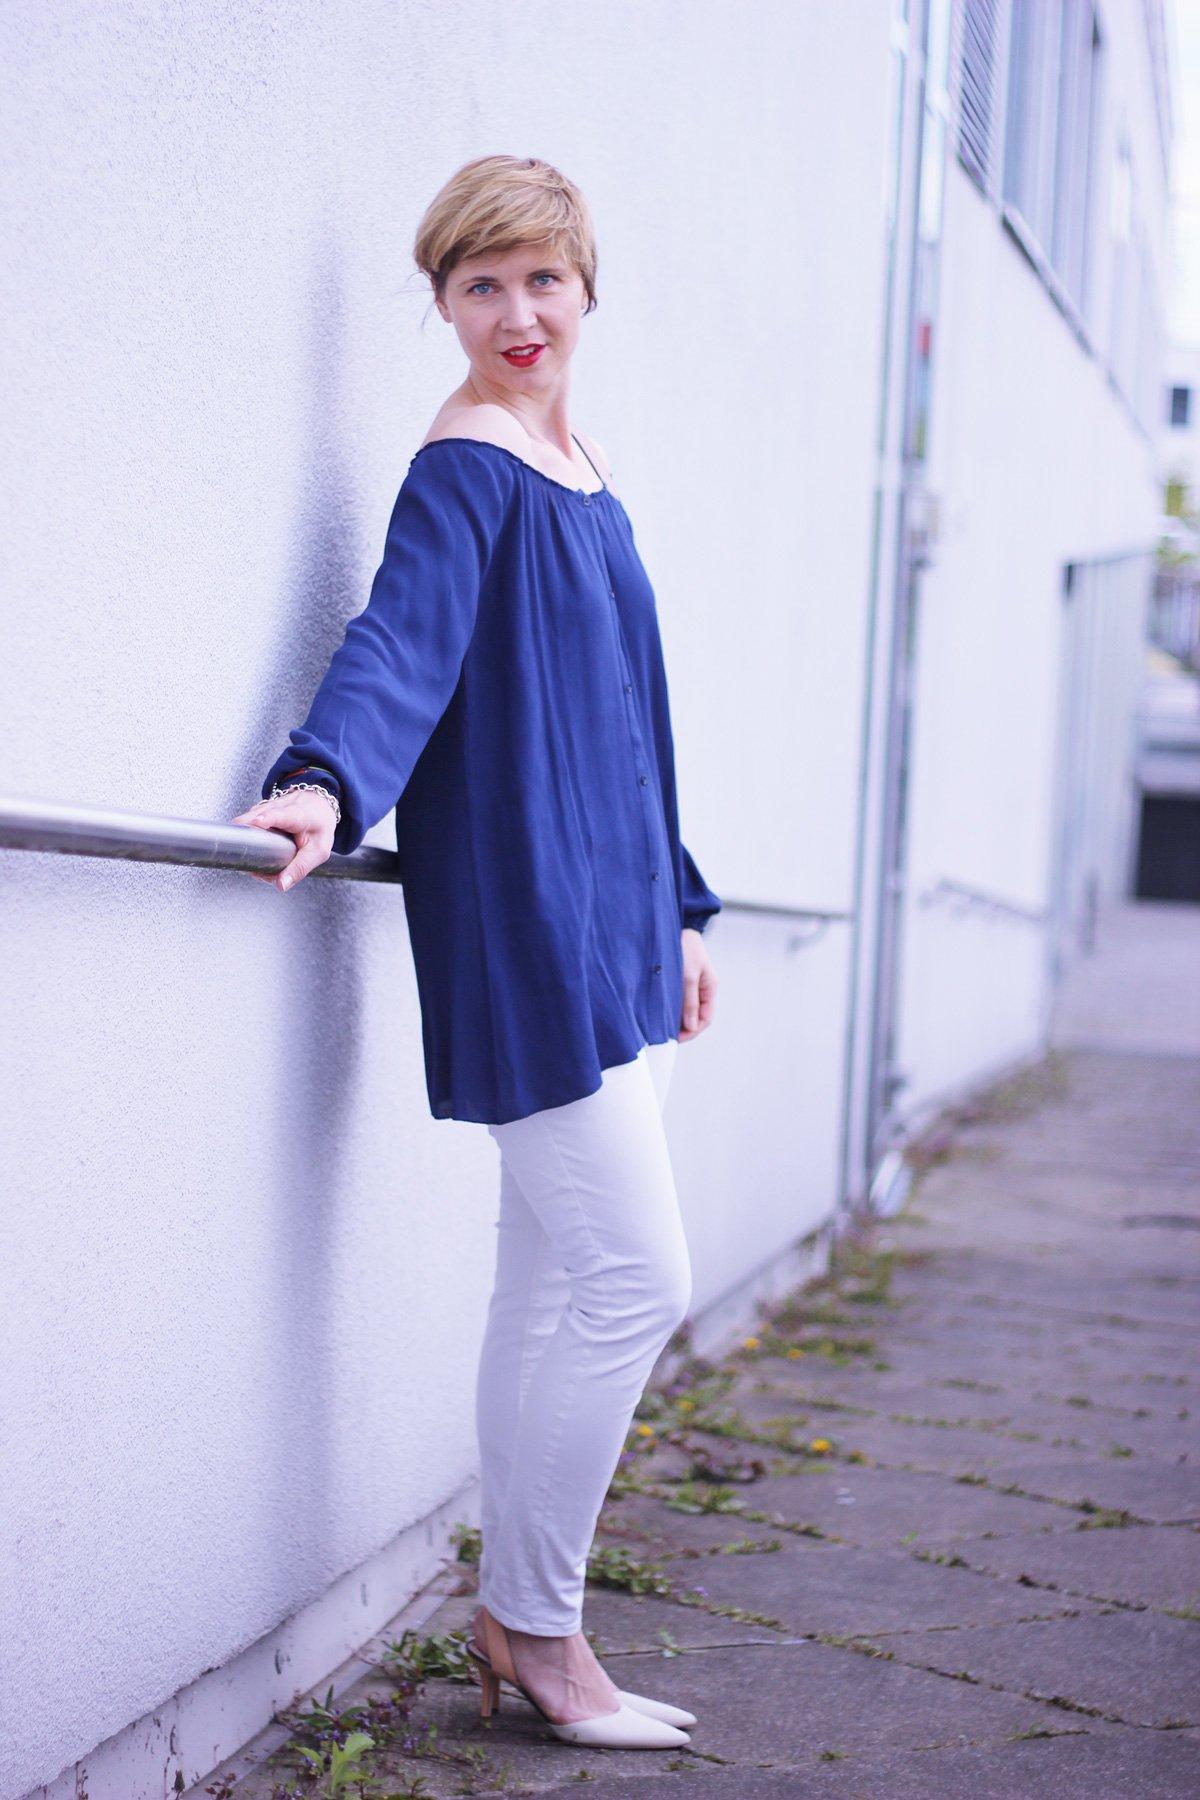 Off-Shoulder-Bluse, American Vintage, blau, Bluse, weiß, old navy, Sam Edelman, Rebecca Minkoff, Conny Doll